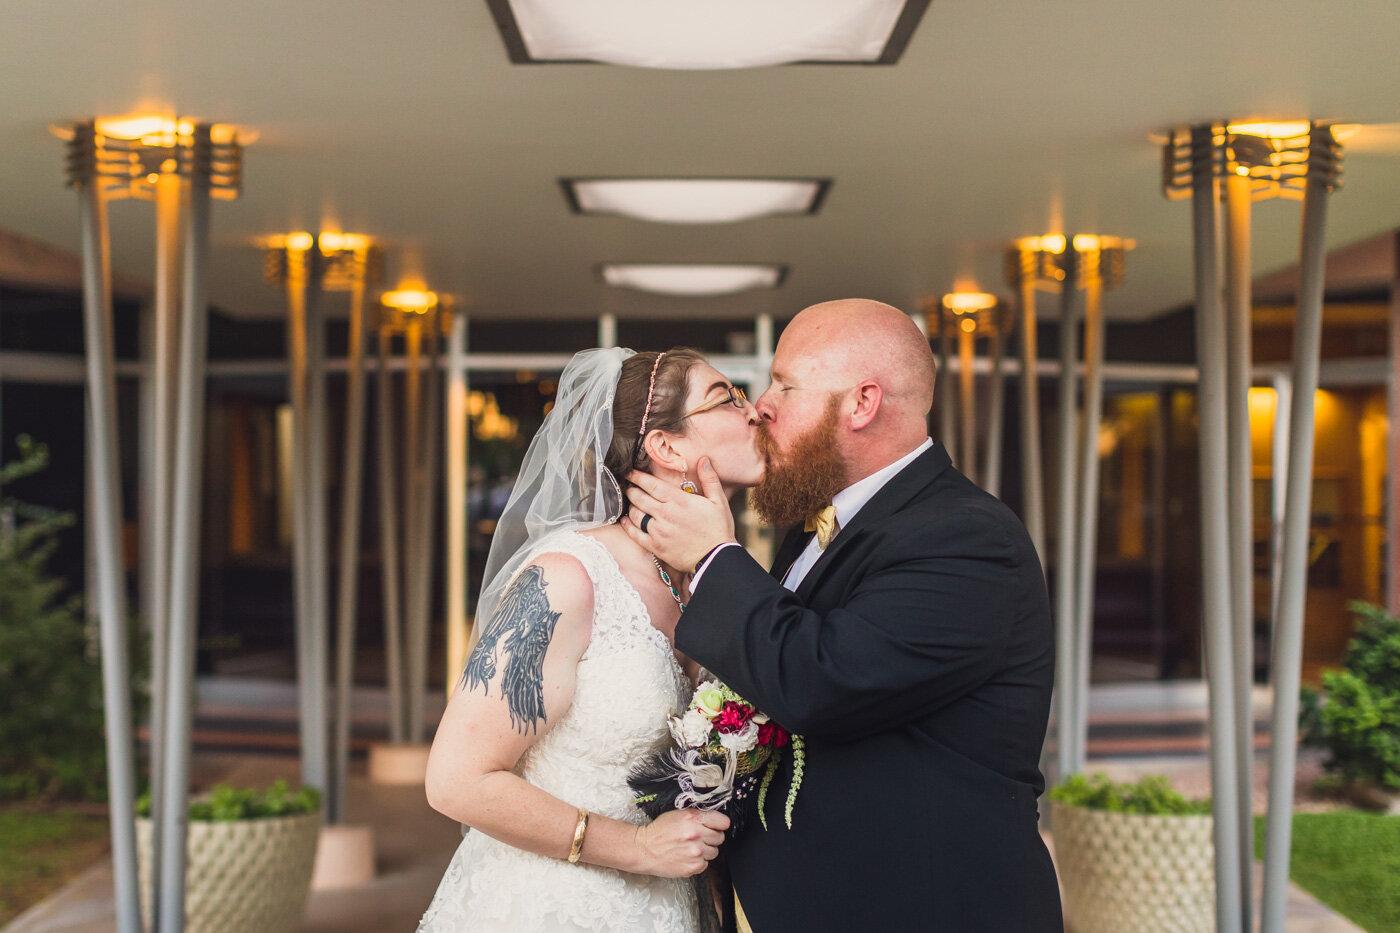 phoenix-wedding-bride-and-groom-kissing